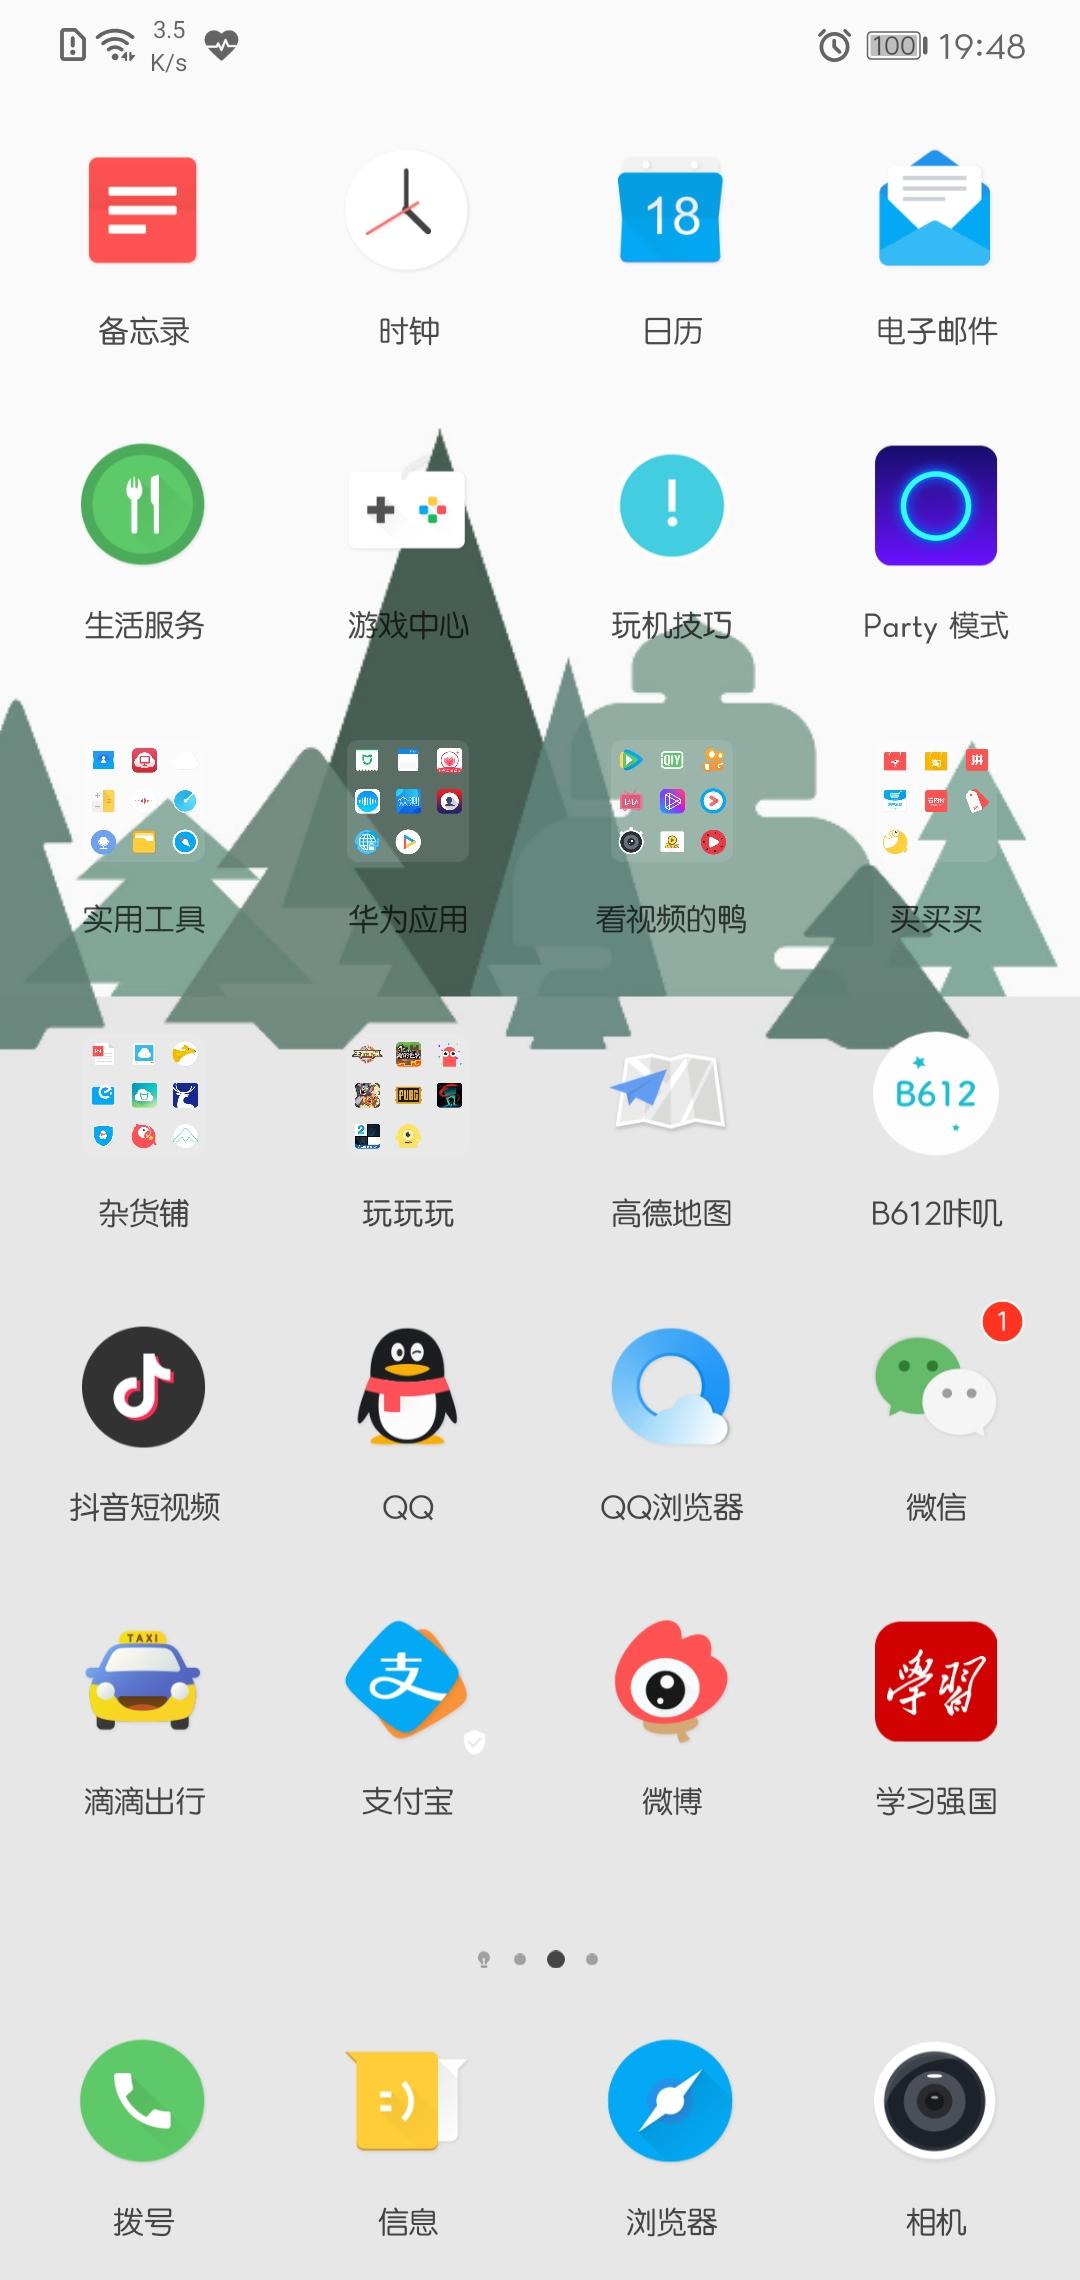 Screenshot_20190618_194835_com.huawei.android.lau.jpg